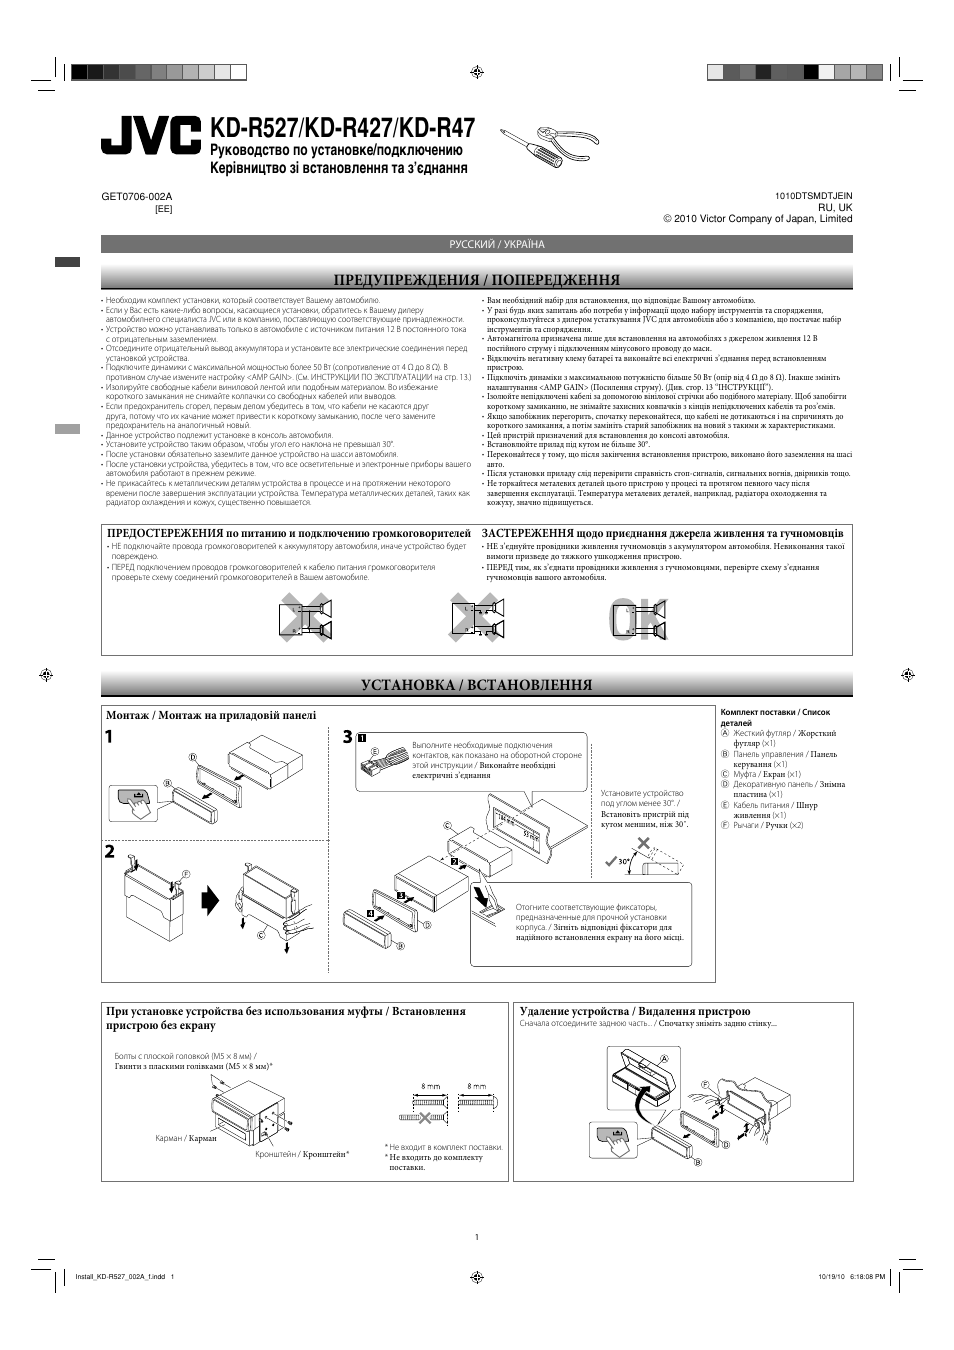 Jvc kd-r425 manual.